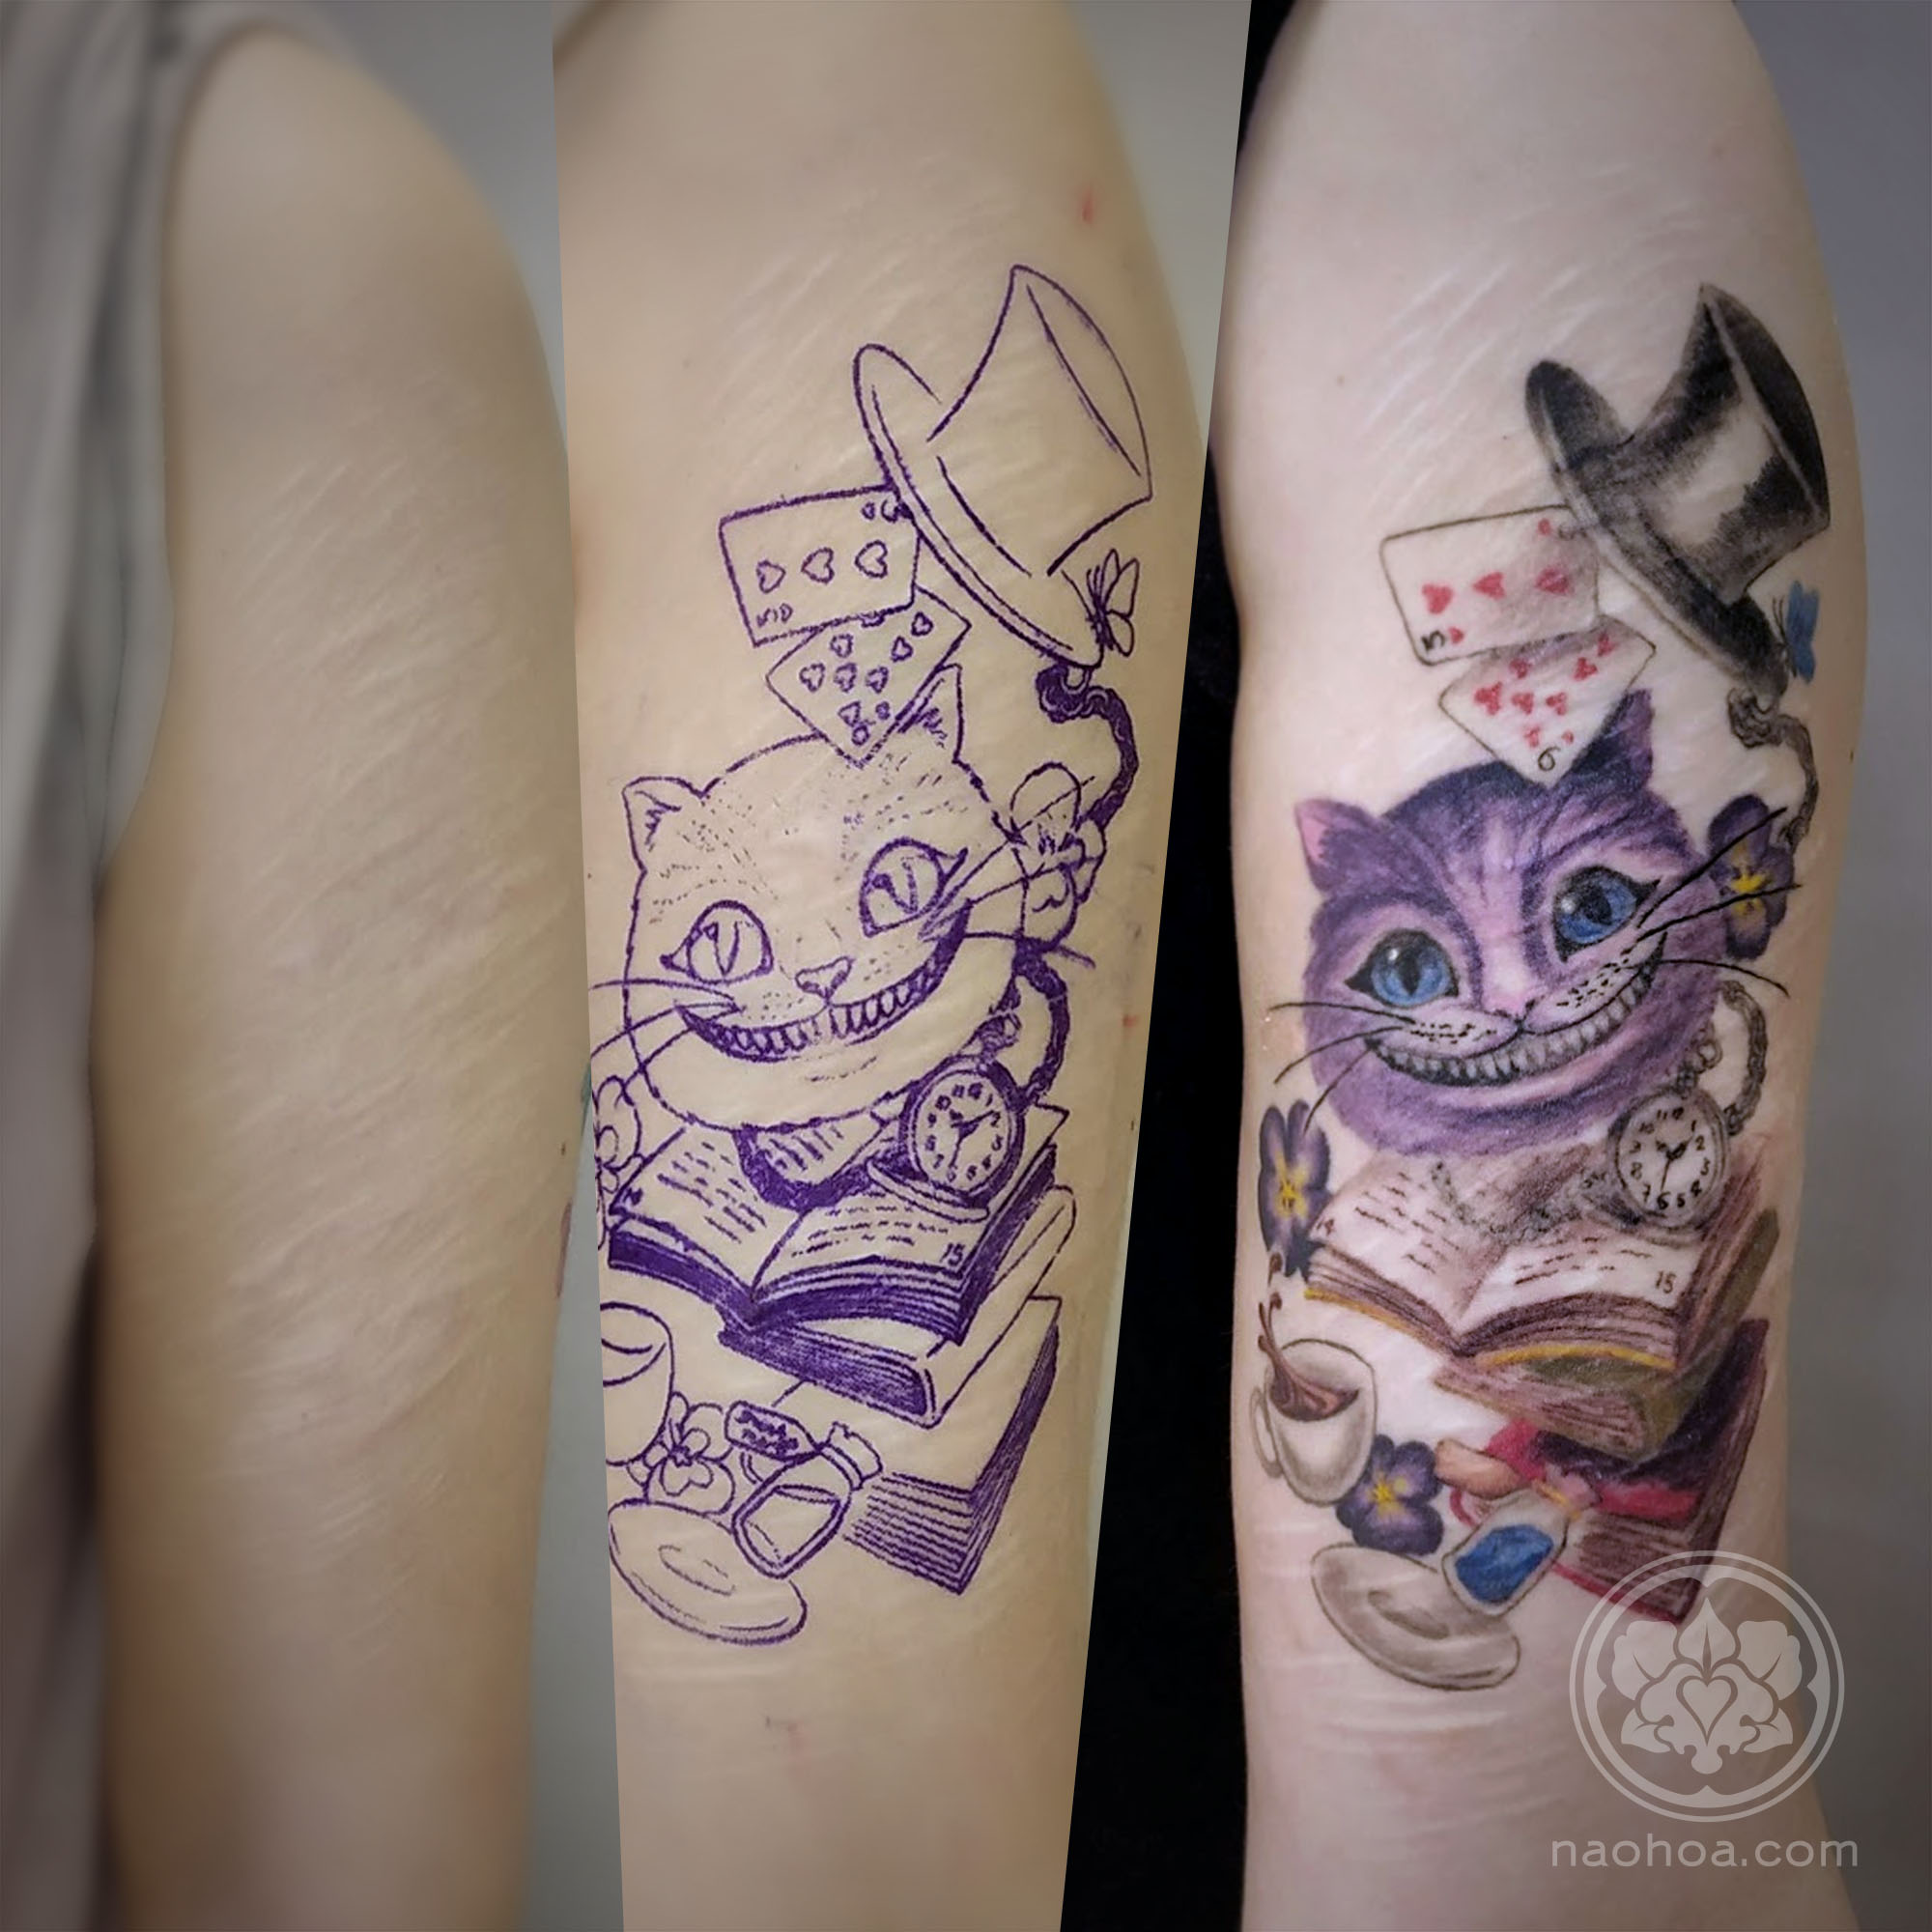 Over harm scars self tattoo Tattoo artist